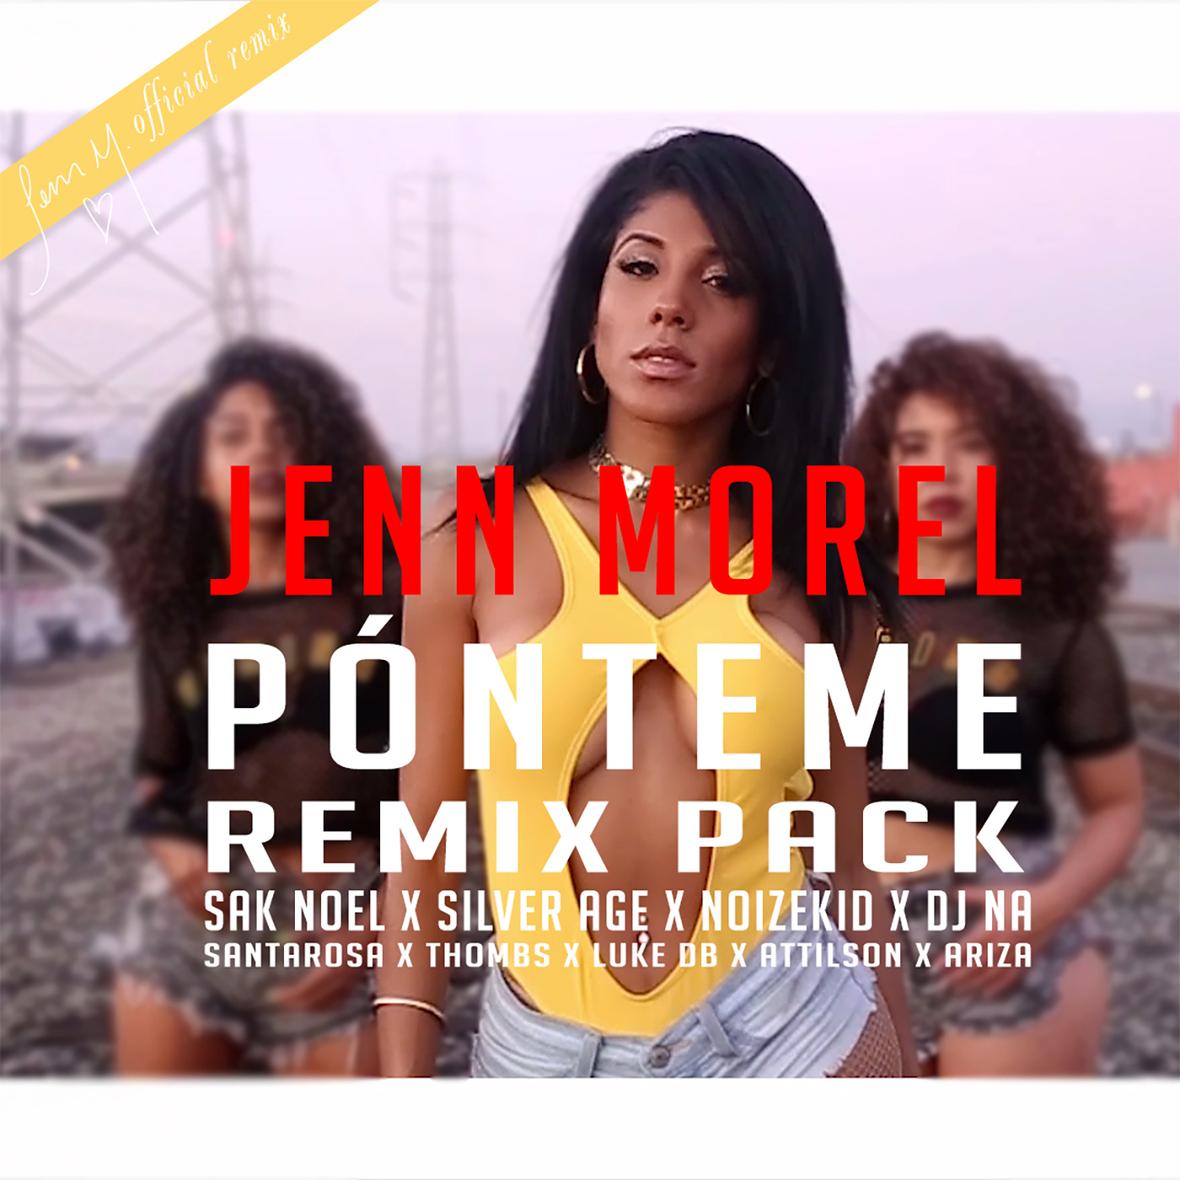 PontemeRemixPack